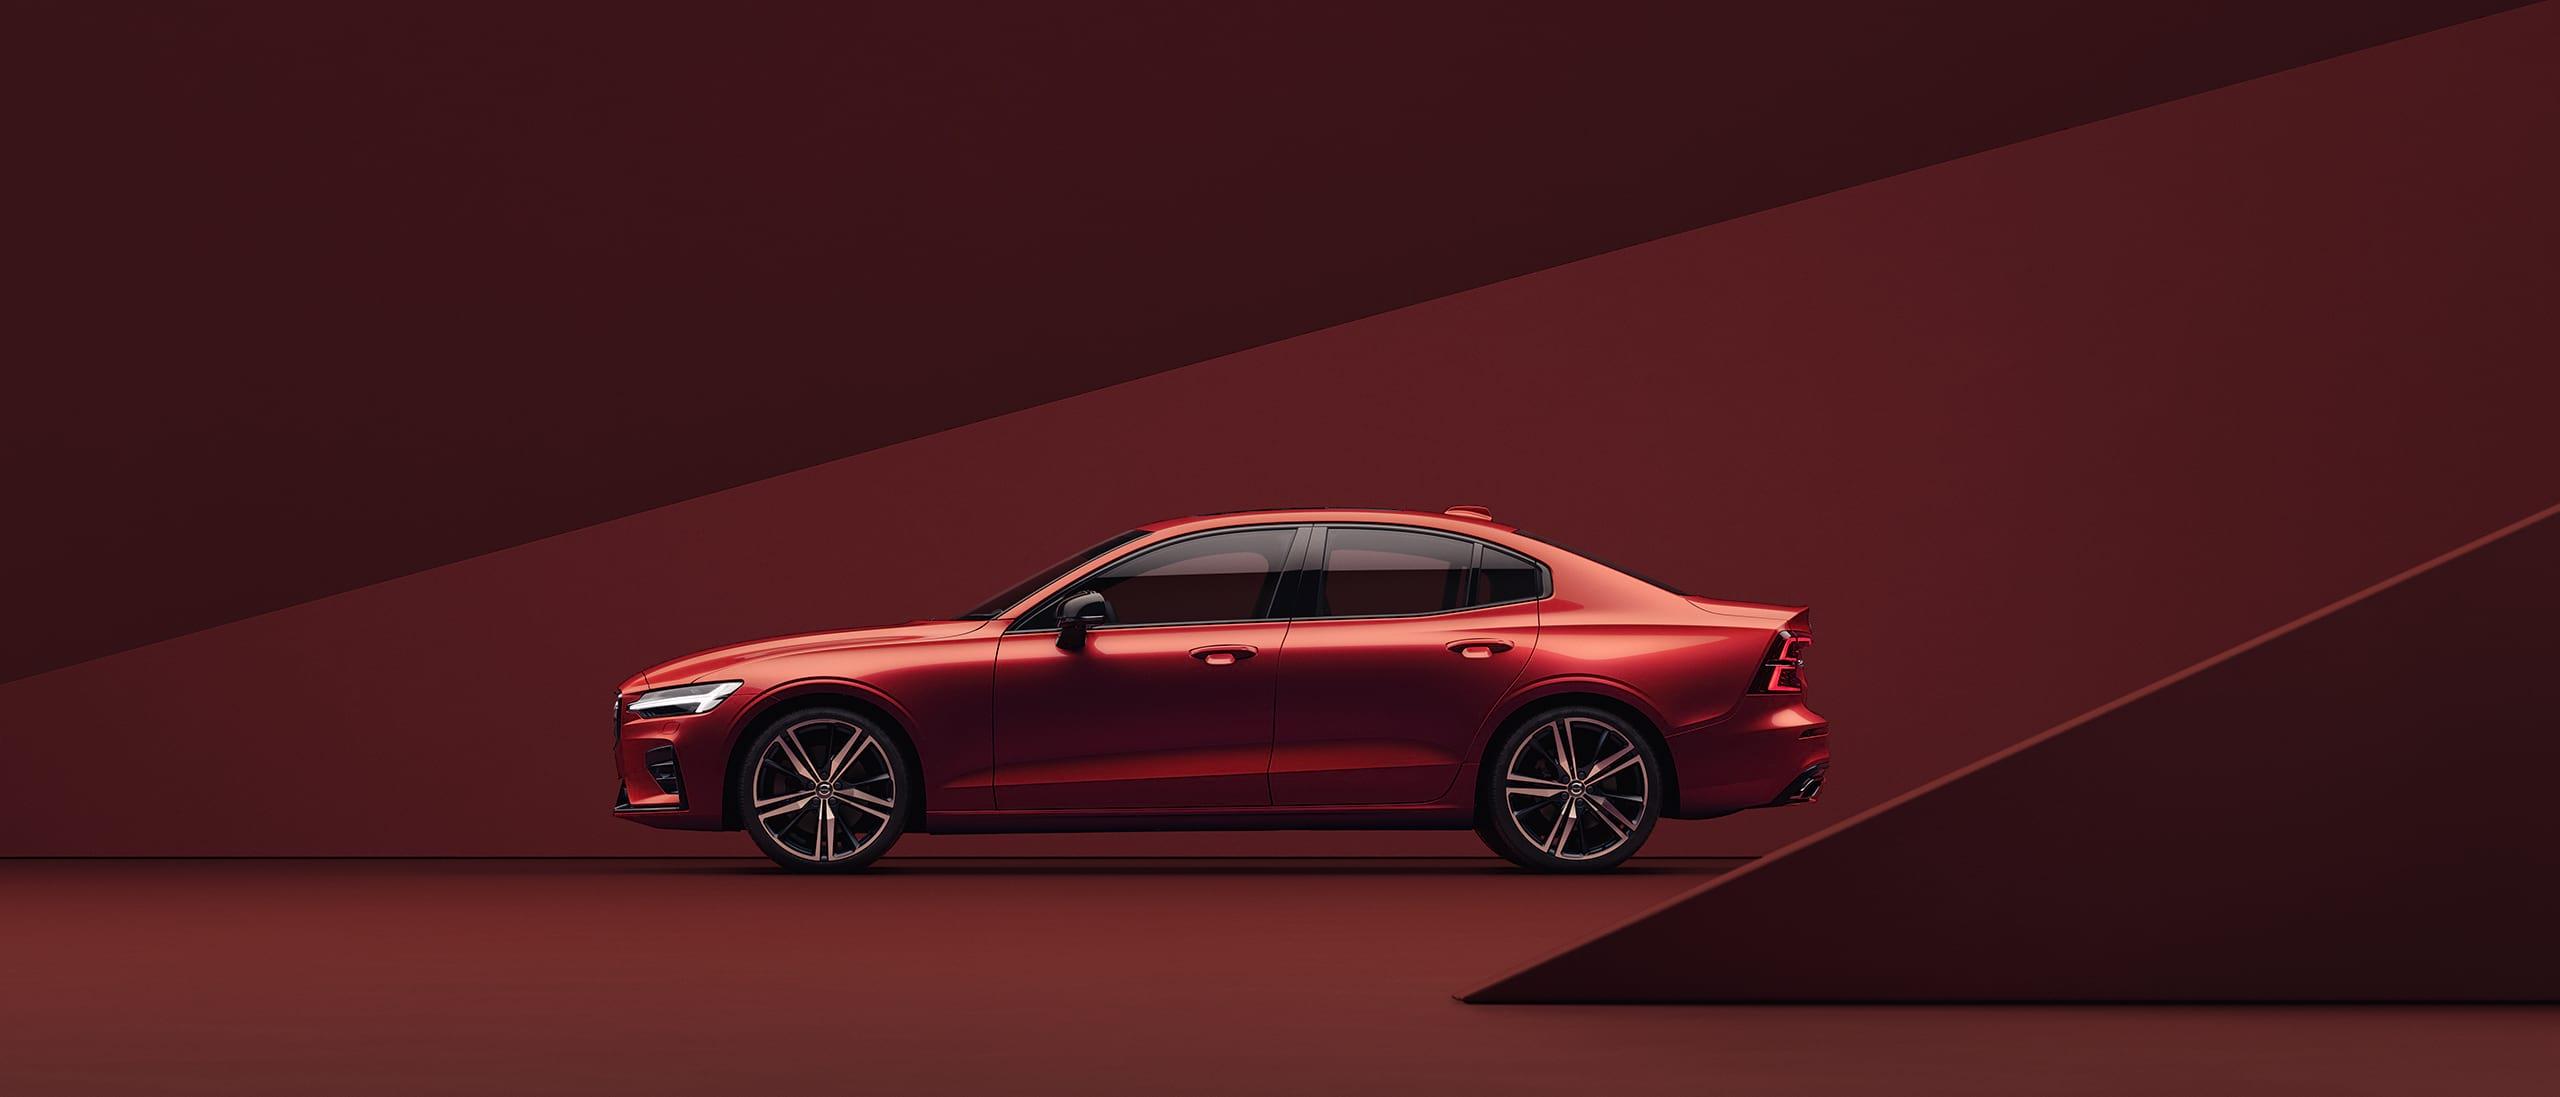 Volvo S60 красного цвета припаркованный на красном фоне